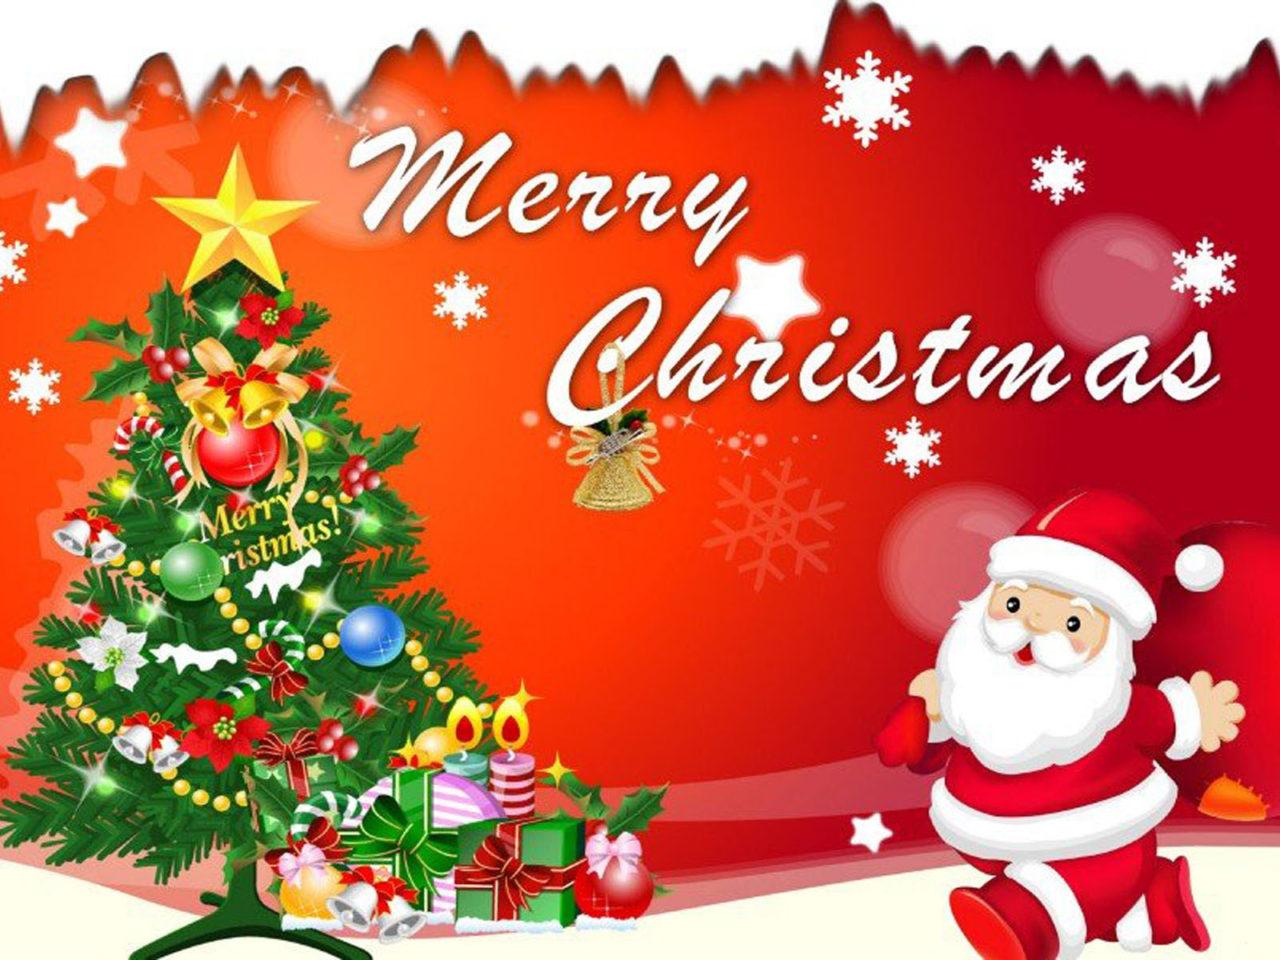 Merry Christmas Santa Claus Christmas Tree Decorations